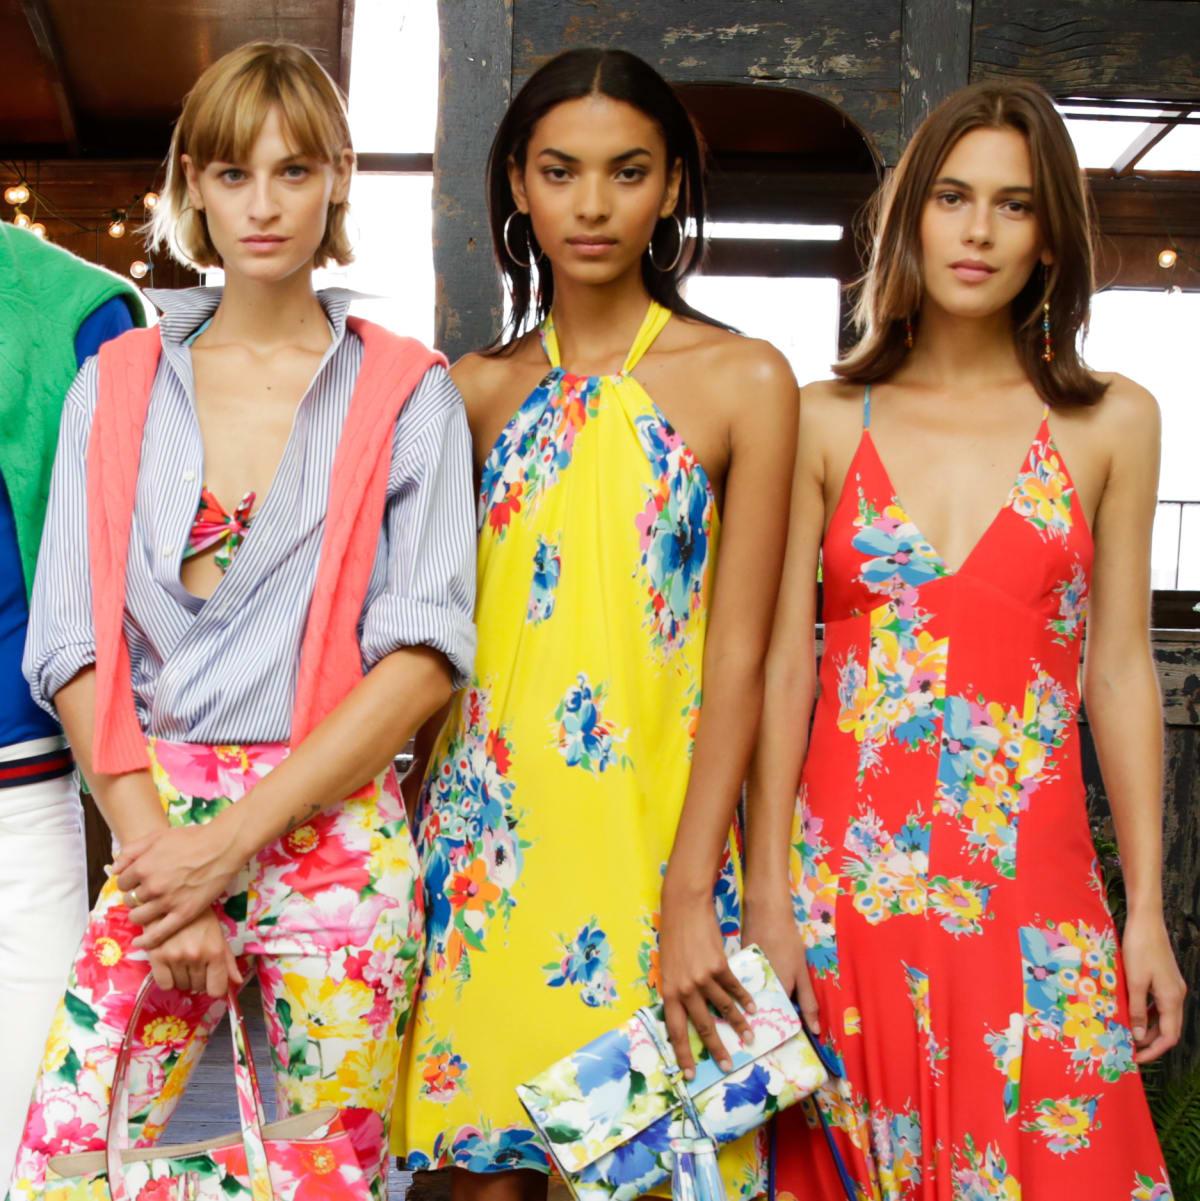 Polo Ralph Lauren spring 2016 presentation at New York Fashion Week